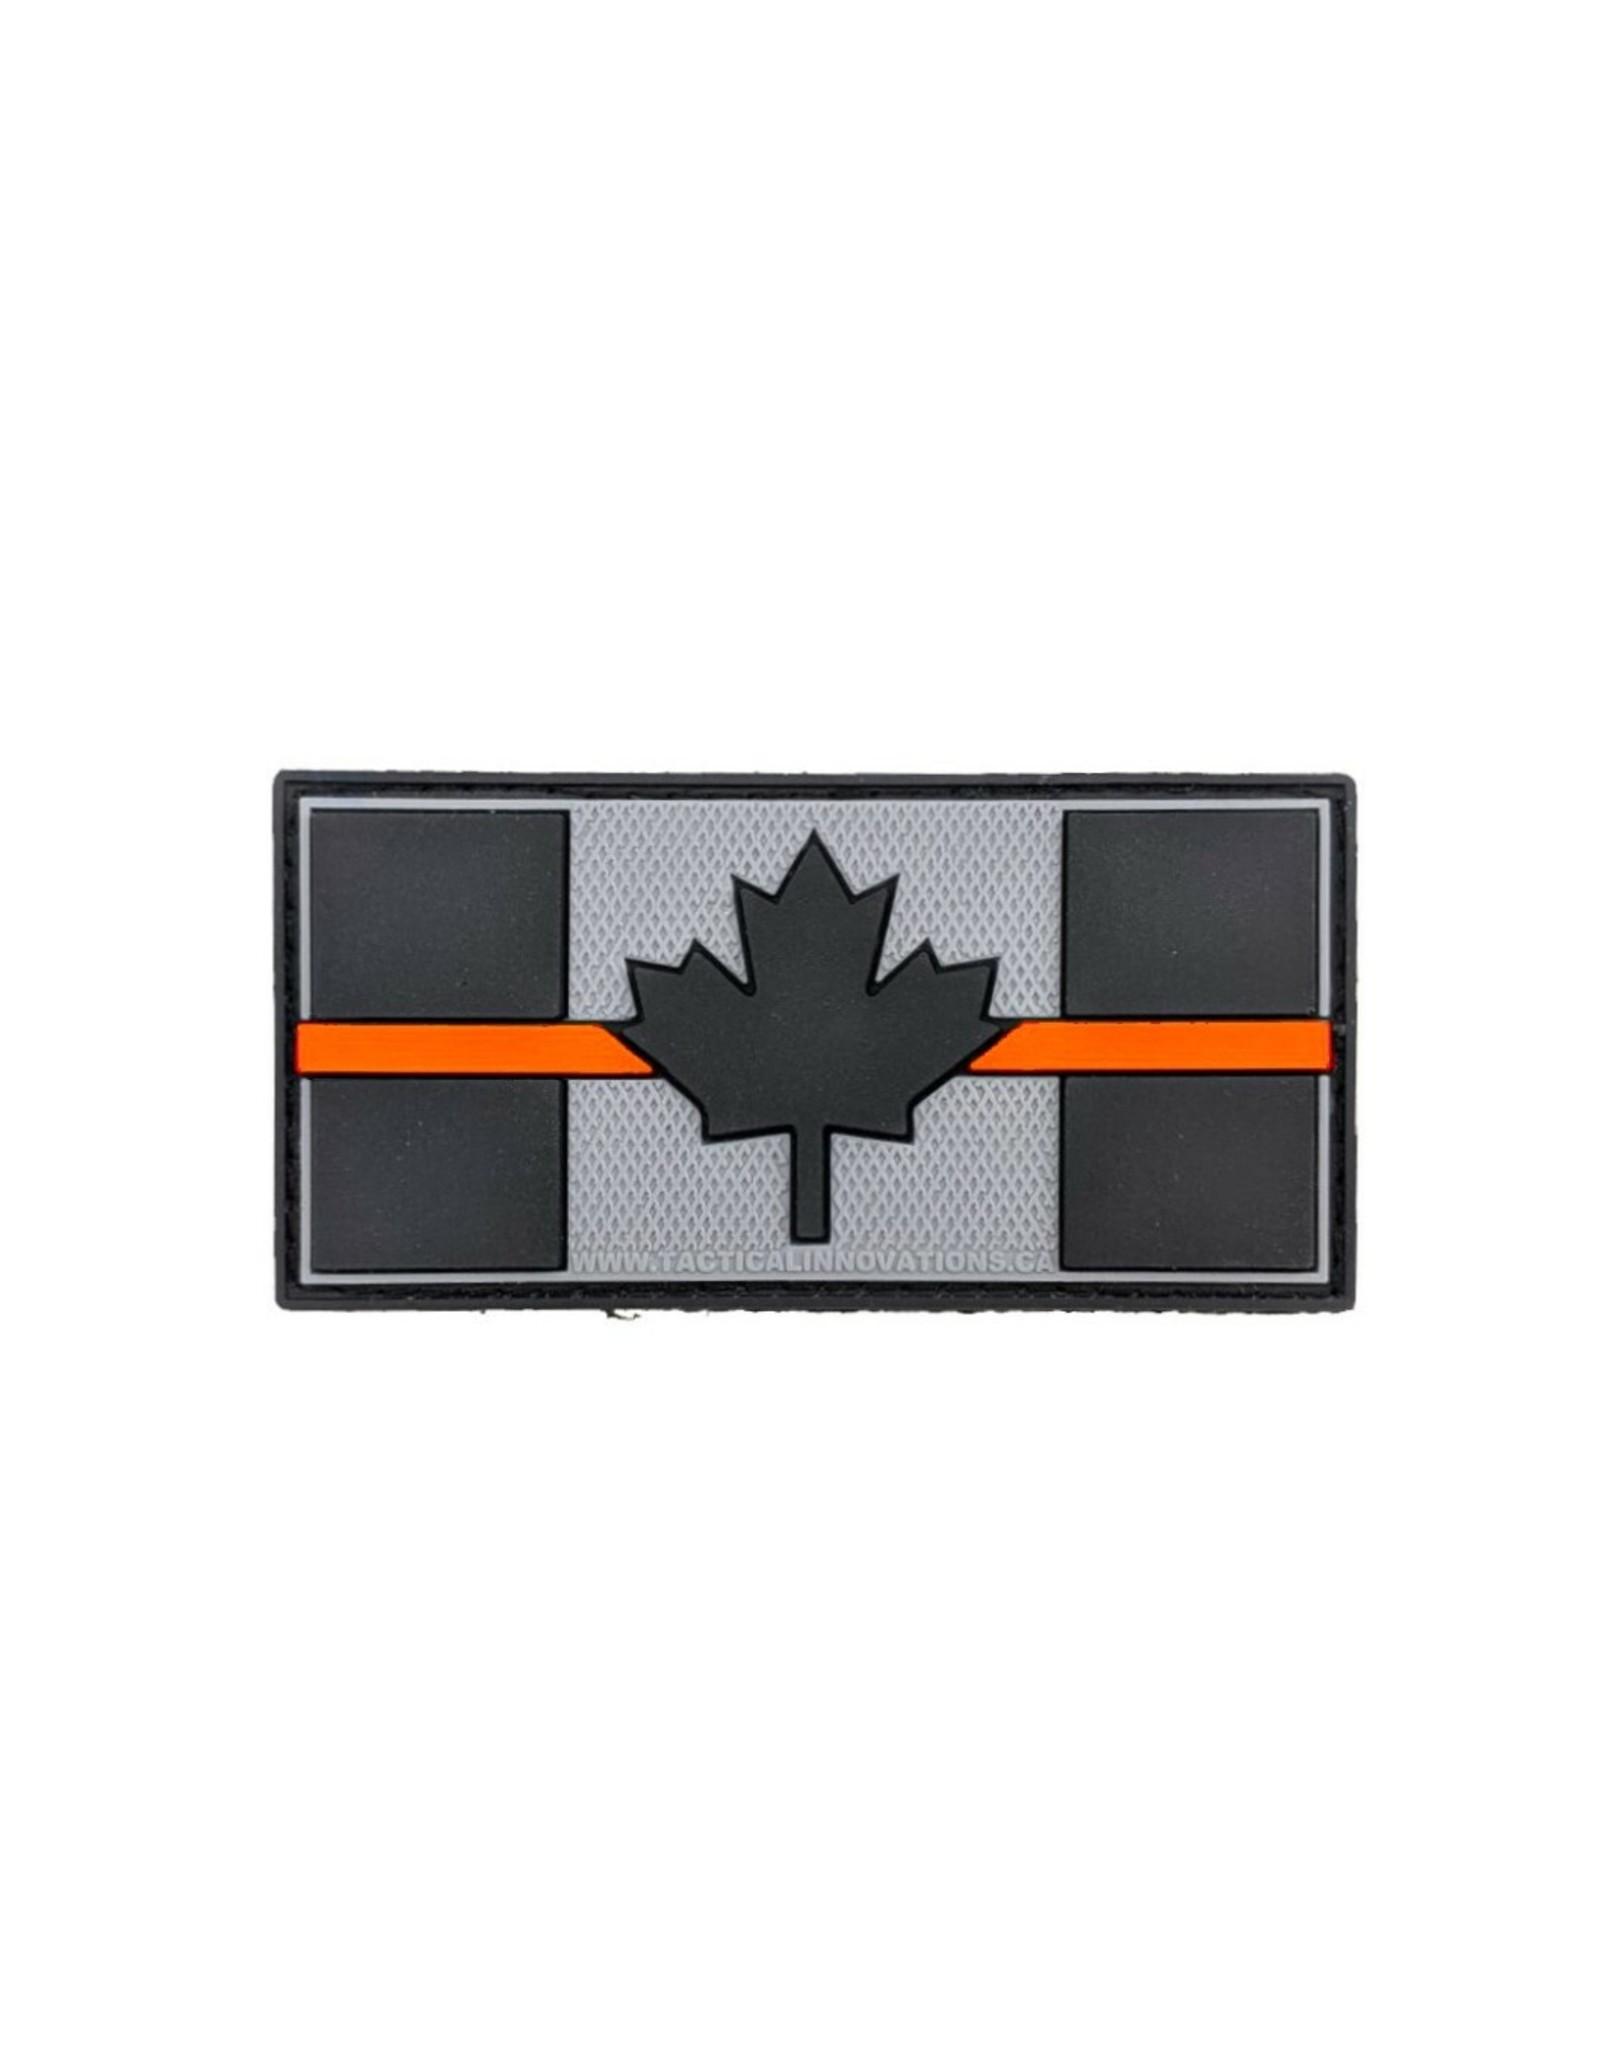 TIC Patch - THIN ORANGE  LINE FLAG 1.5X3